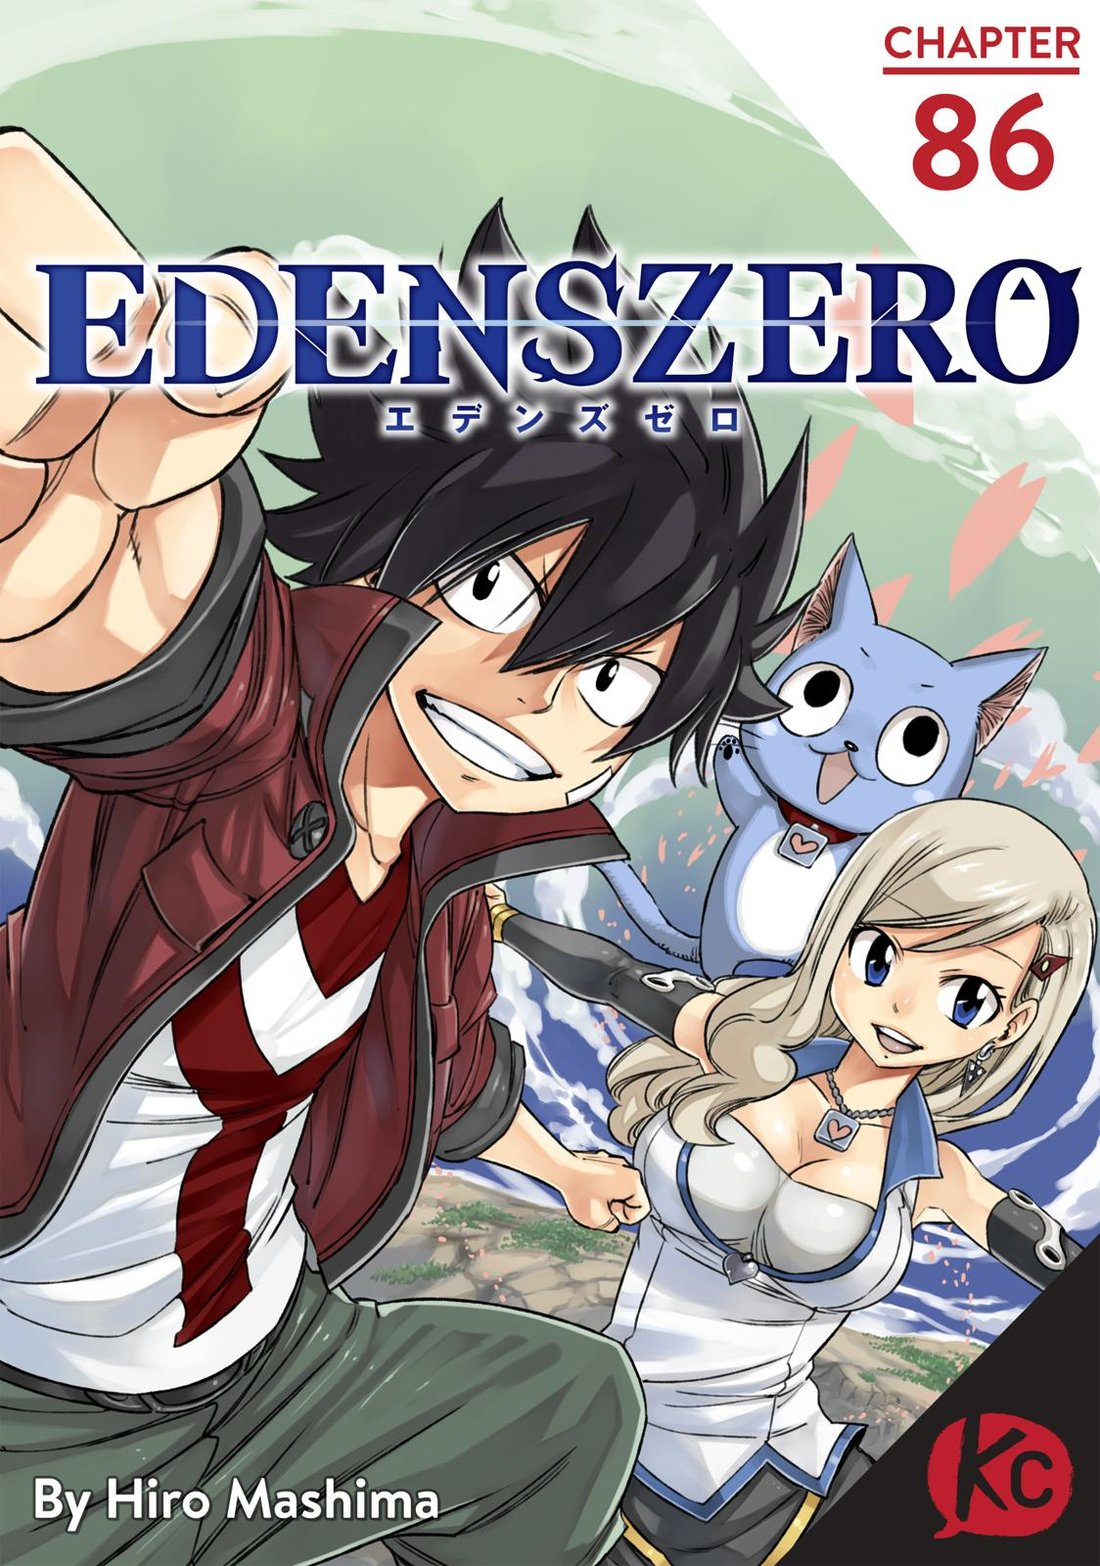 https://manga.mangadogs.com/comics/pic2/28/21852/1208260/998c0c4fd994dc56798676eb8017a9b9.jpg Page 1